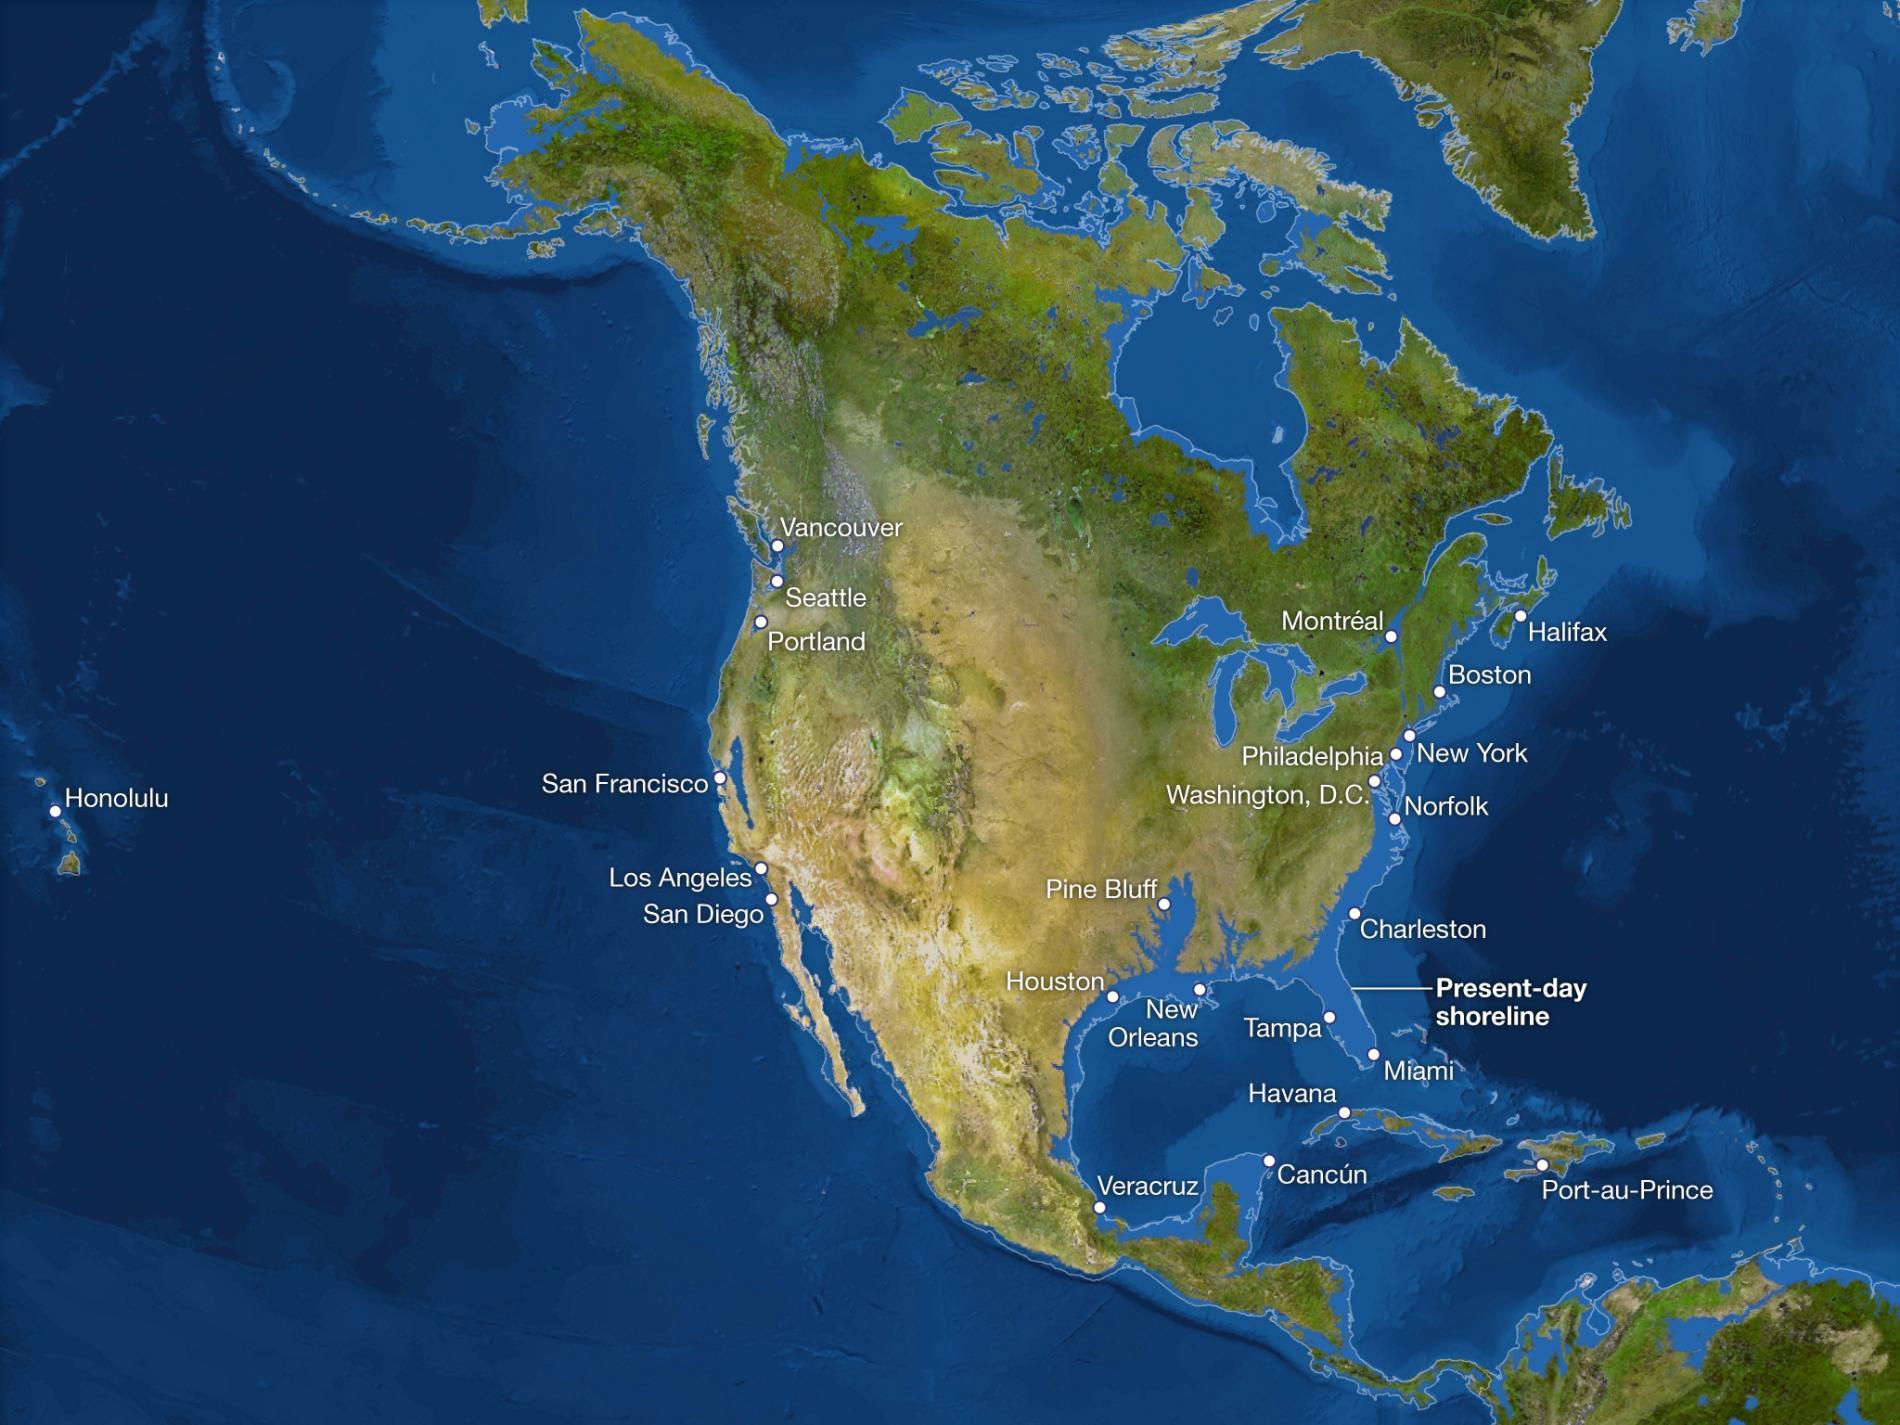 01-ice-melt-north-america.adapt.1900.1